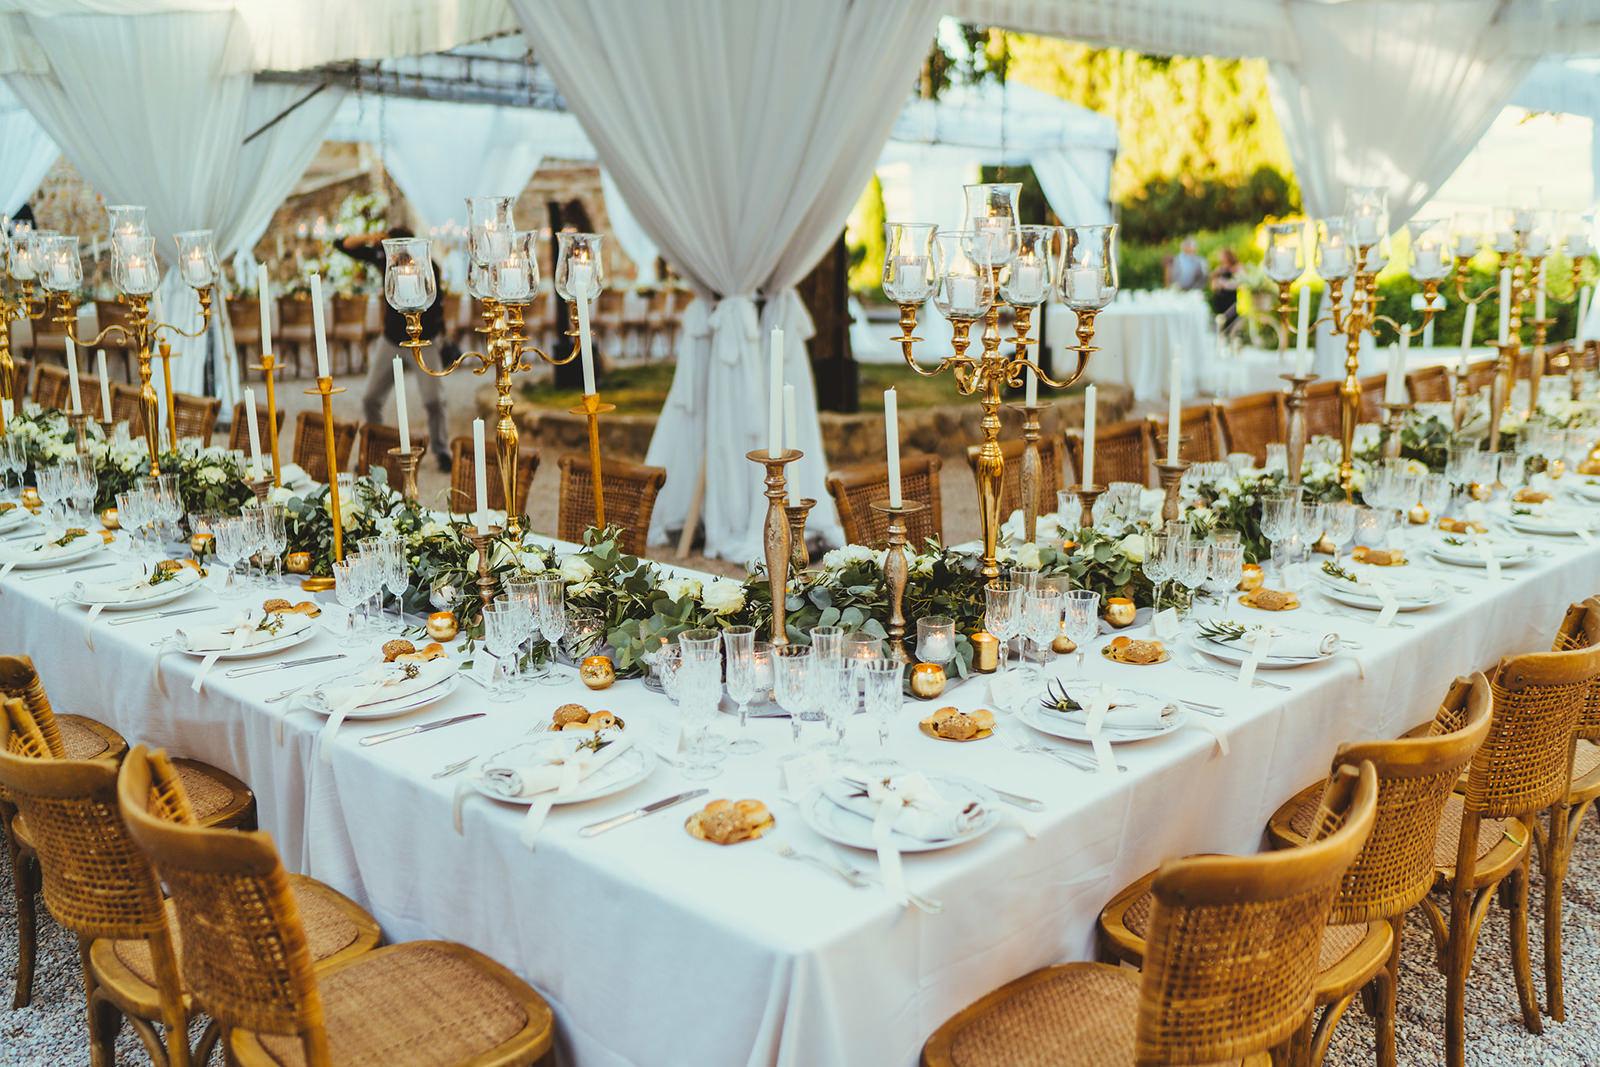 Italian Wedding Ideas The Imperial Table